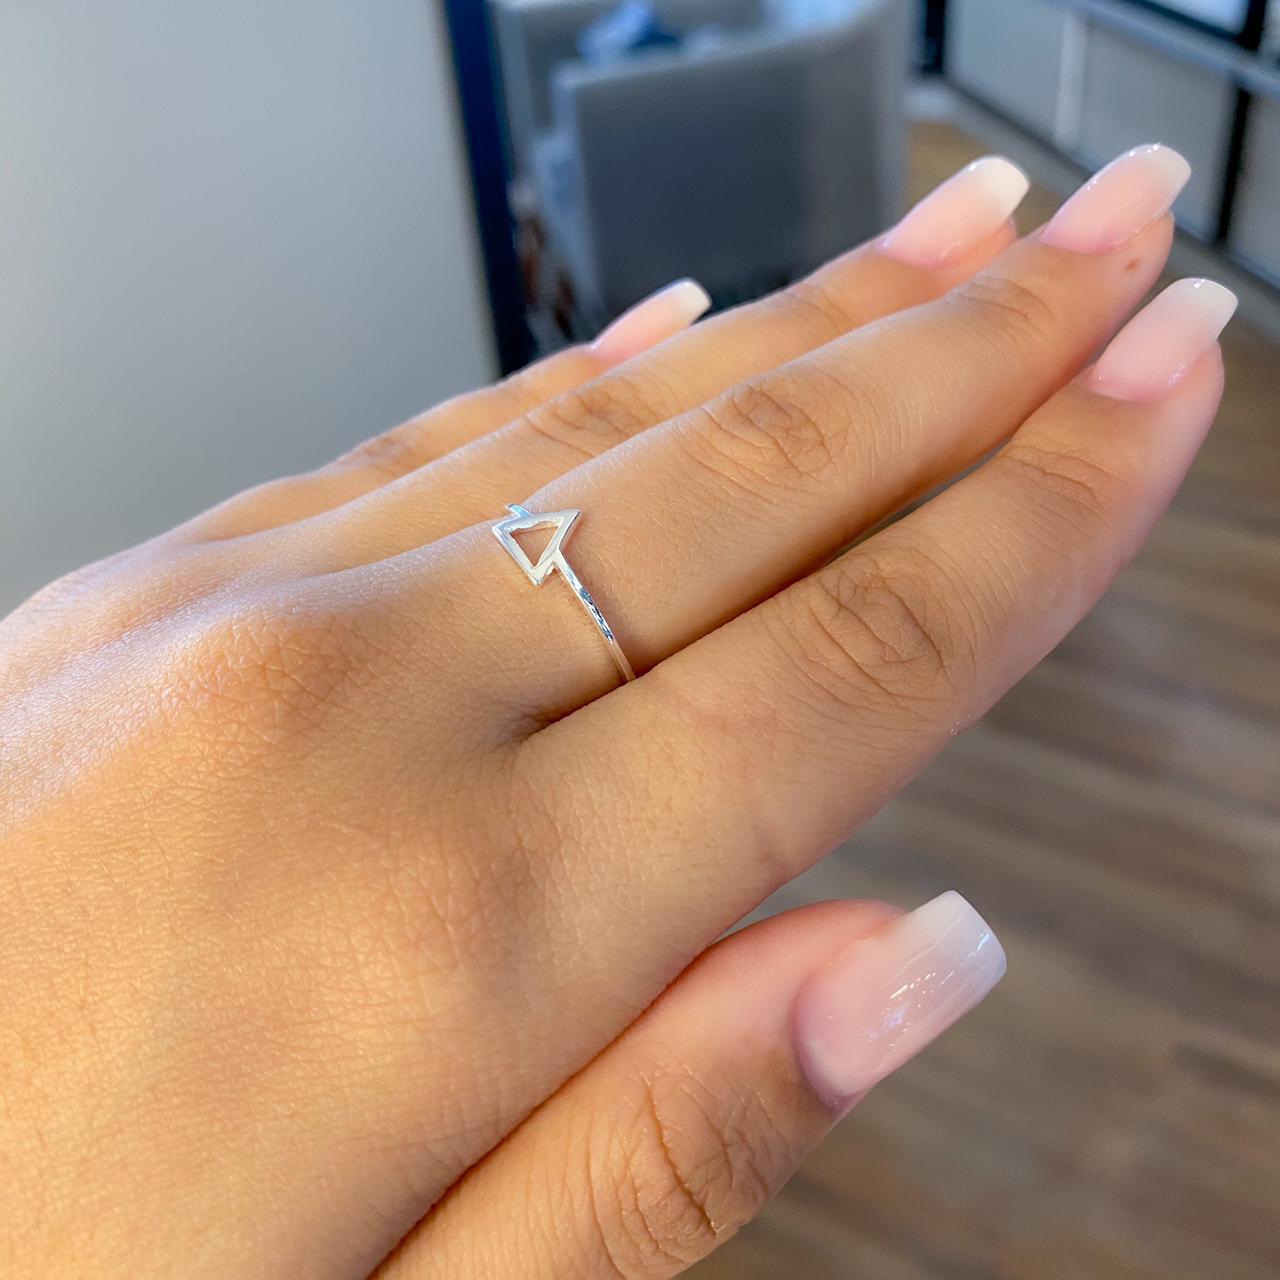 Anel de Prata Triângulo Pequeno